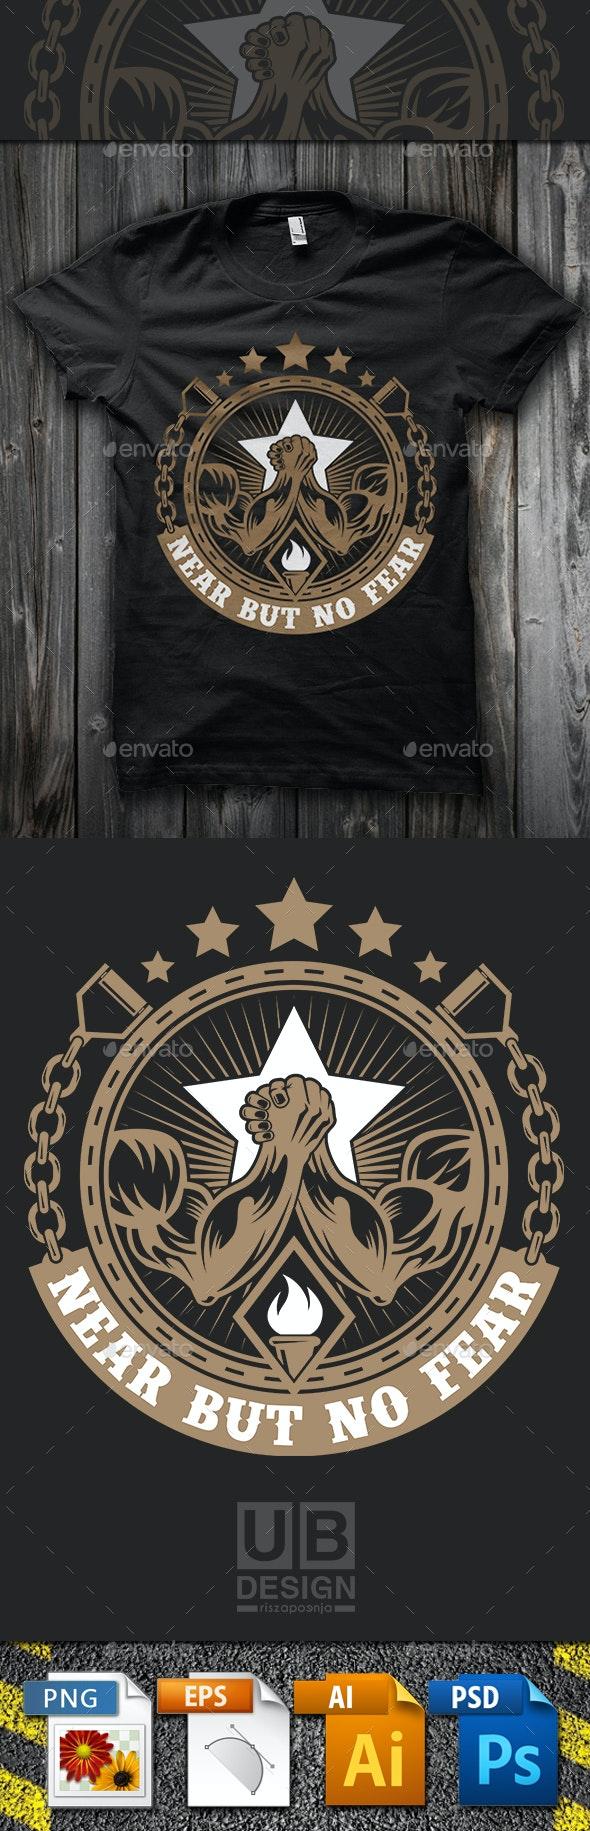 Arm Wrestling T Shirt Template - Sports & Teams T-Shirts